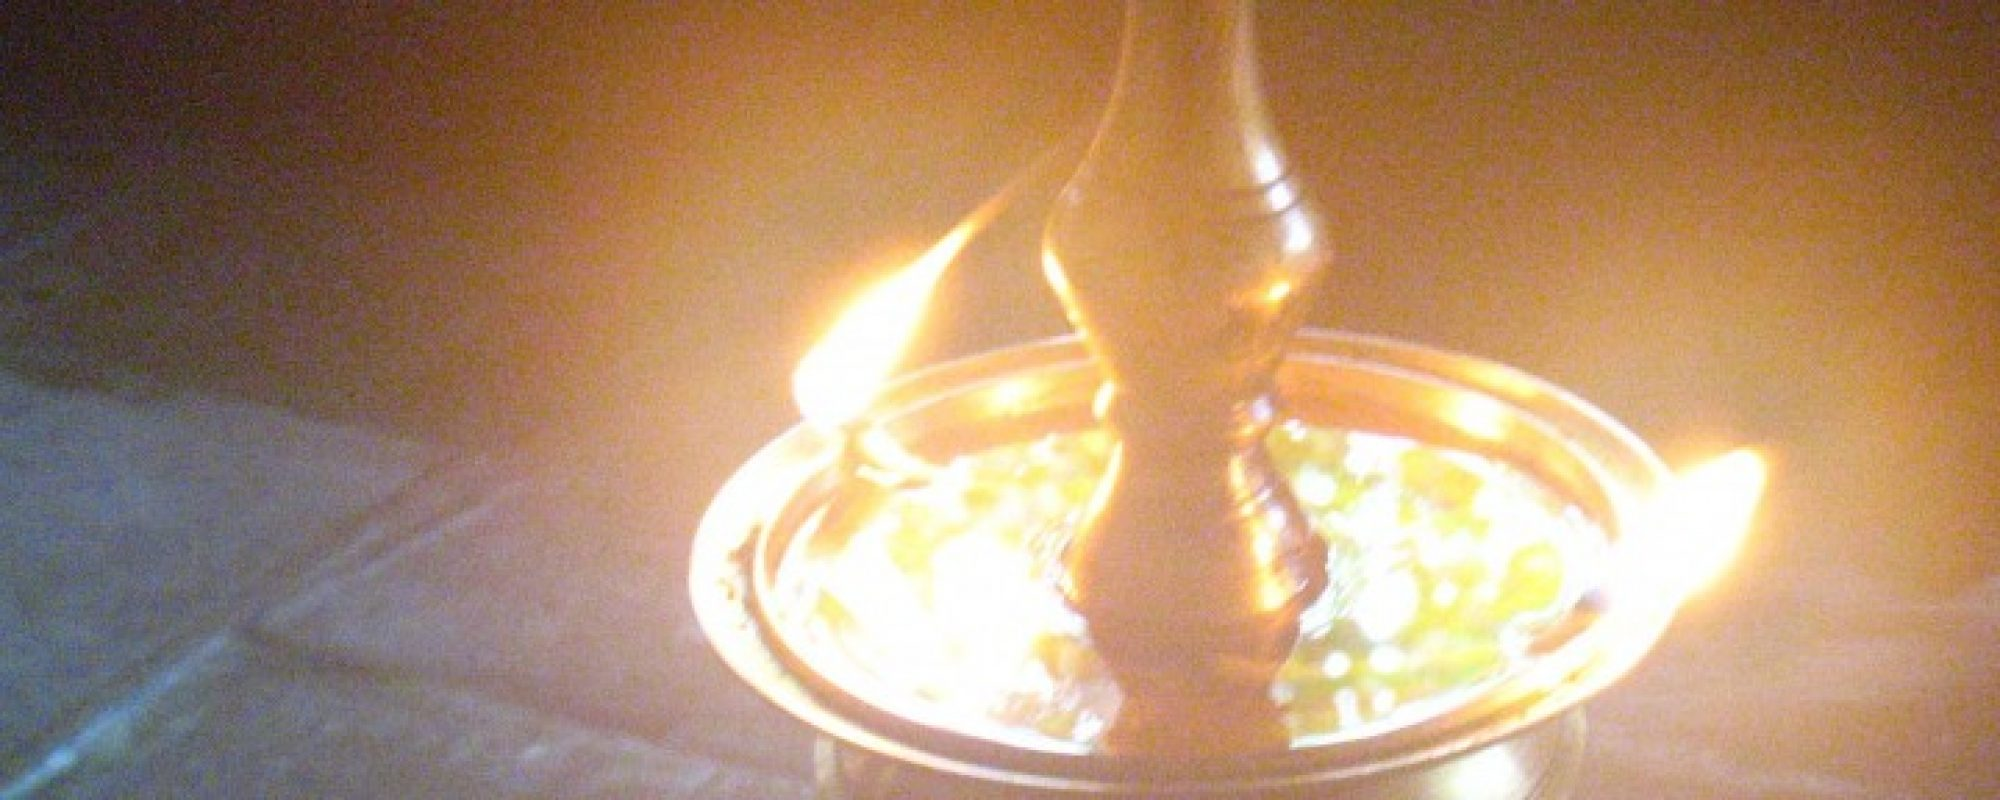 cropped-cropped-lamp.jpg